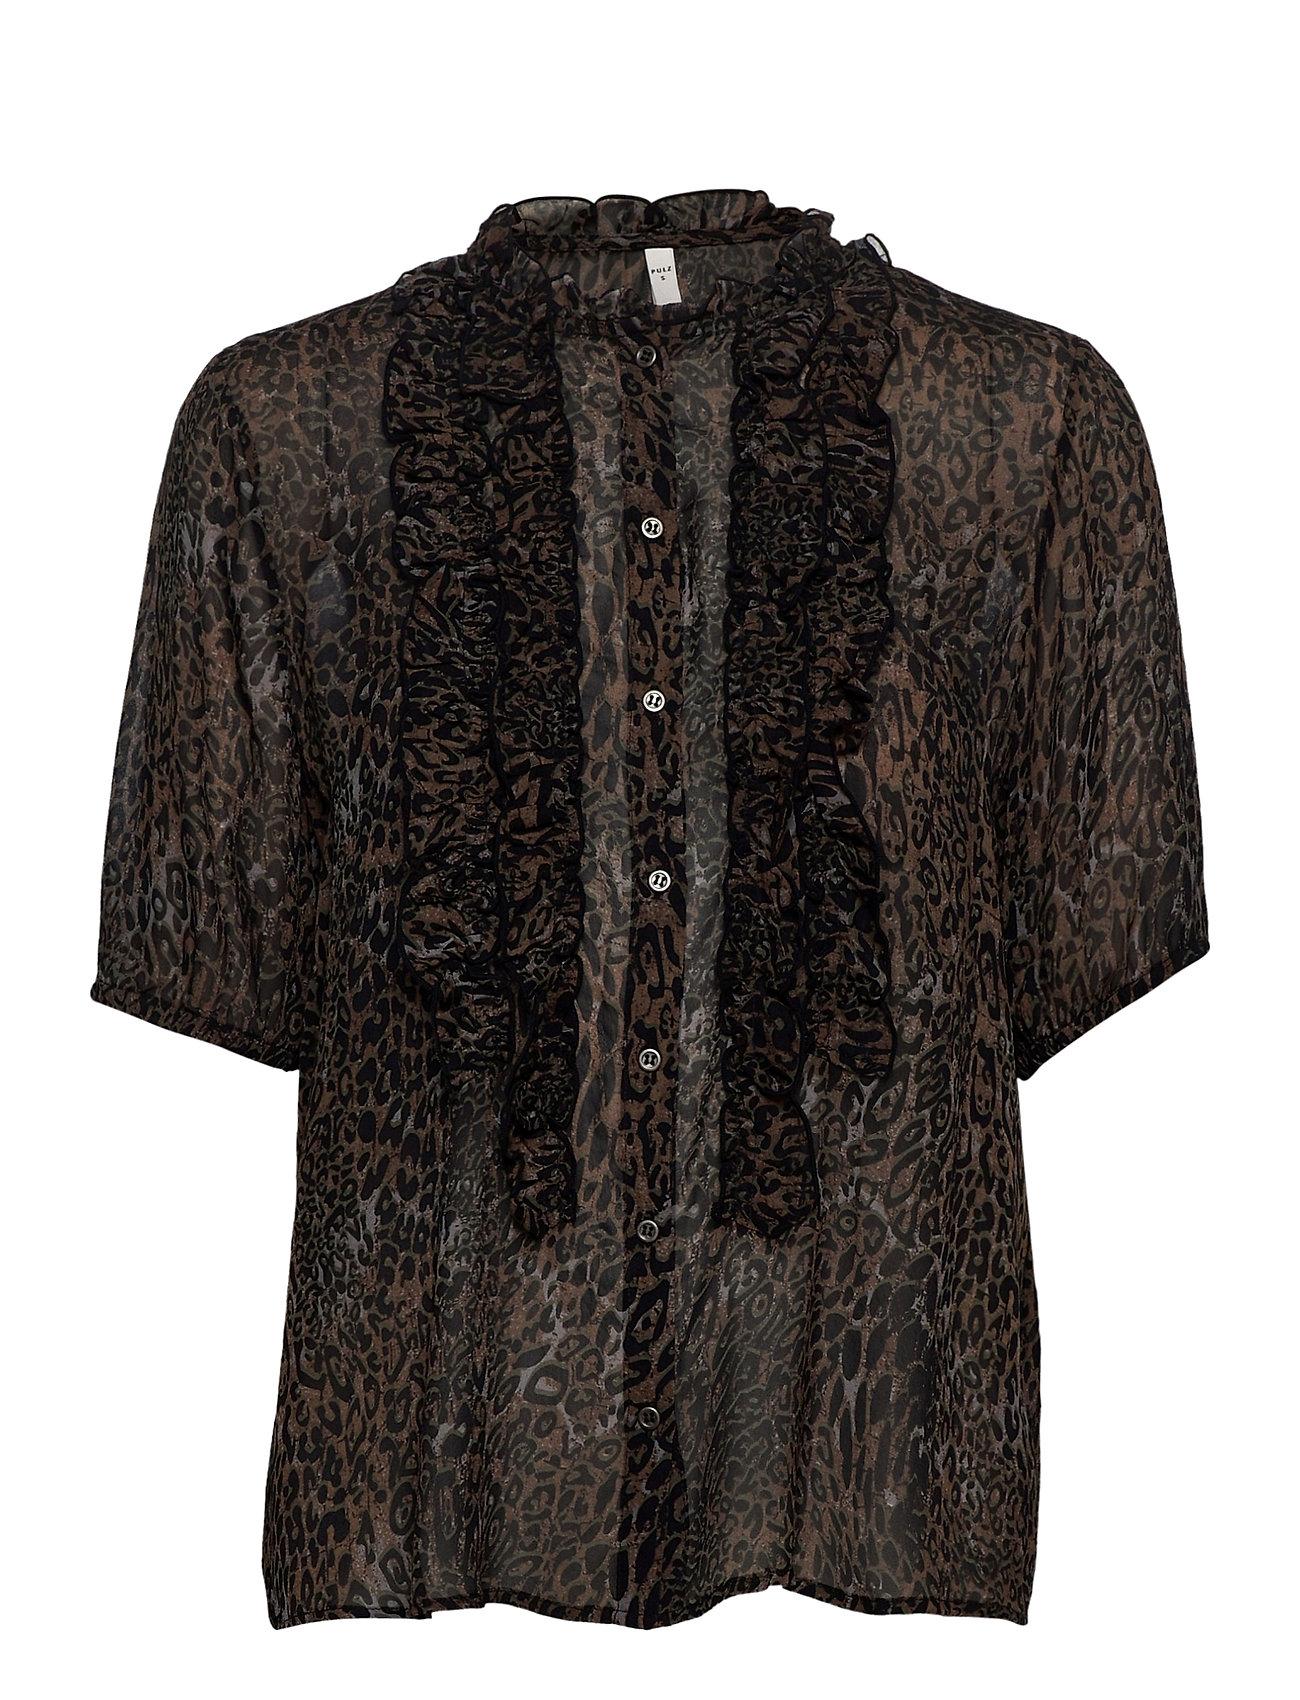 Image of Pzamaya Blouse Premium Quality Blouses Short-sleeved Sort Pulz Jeans (3454497863)